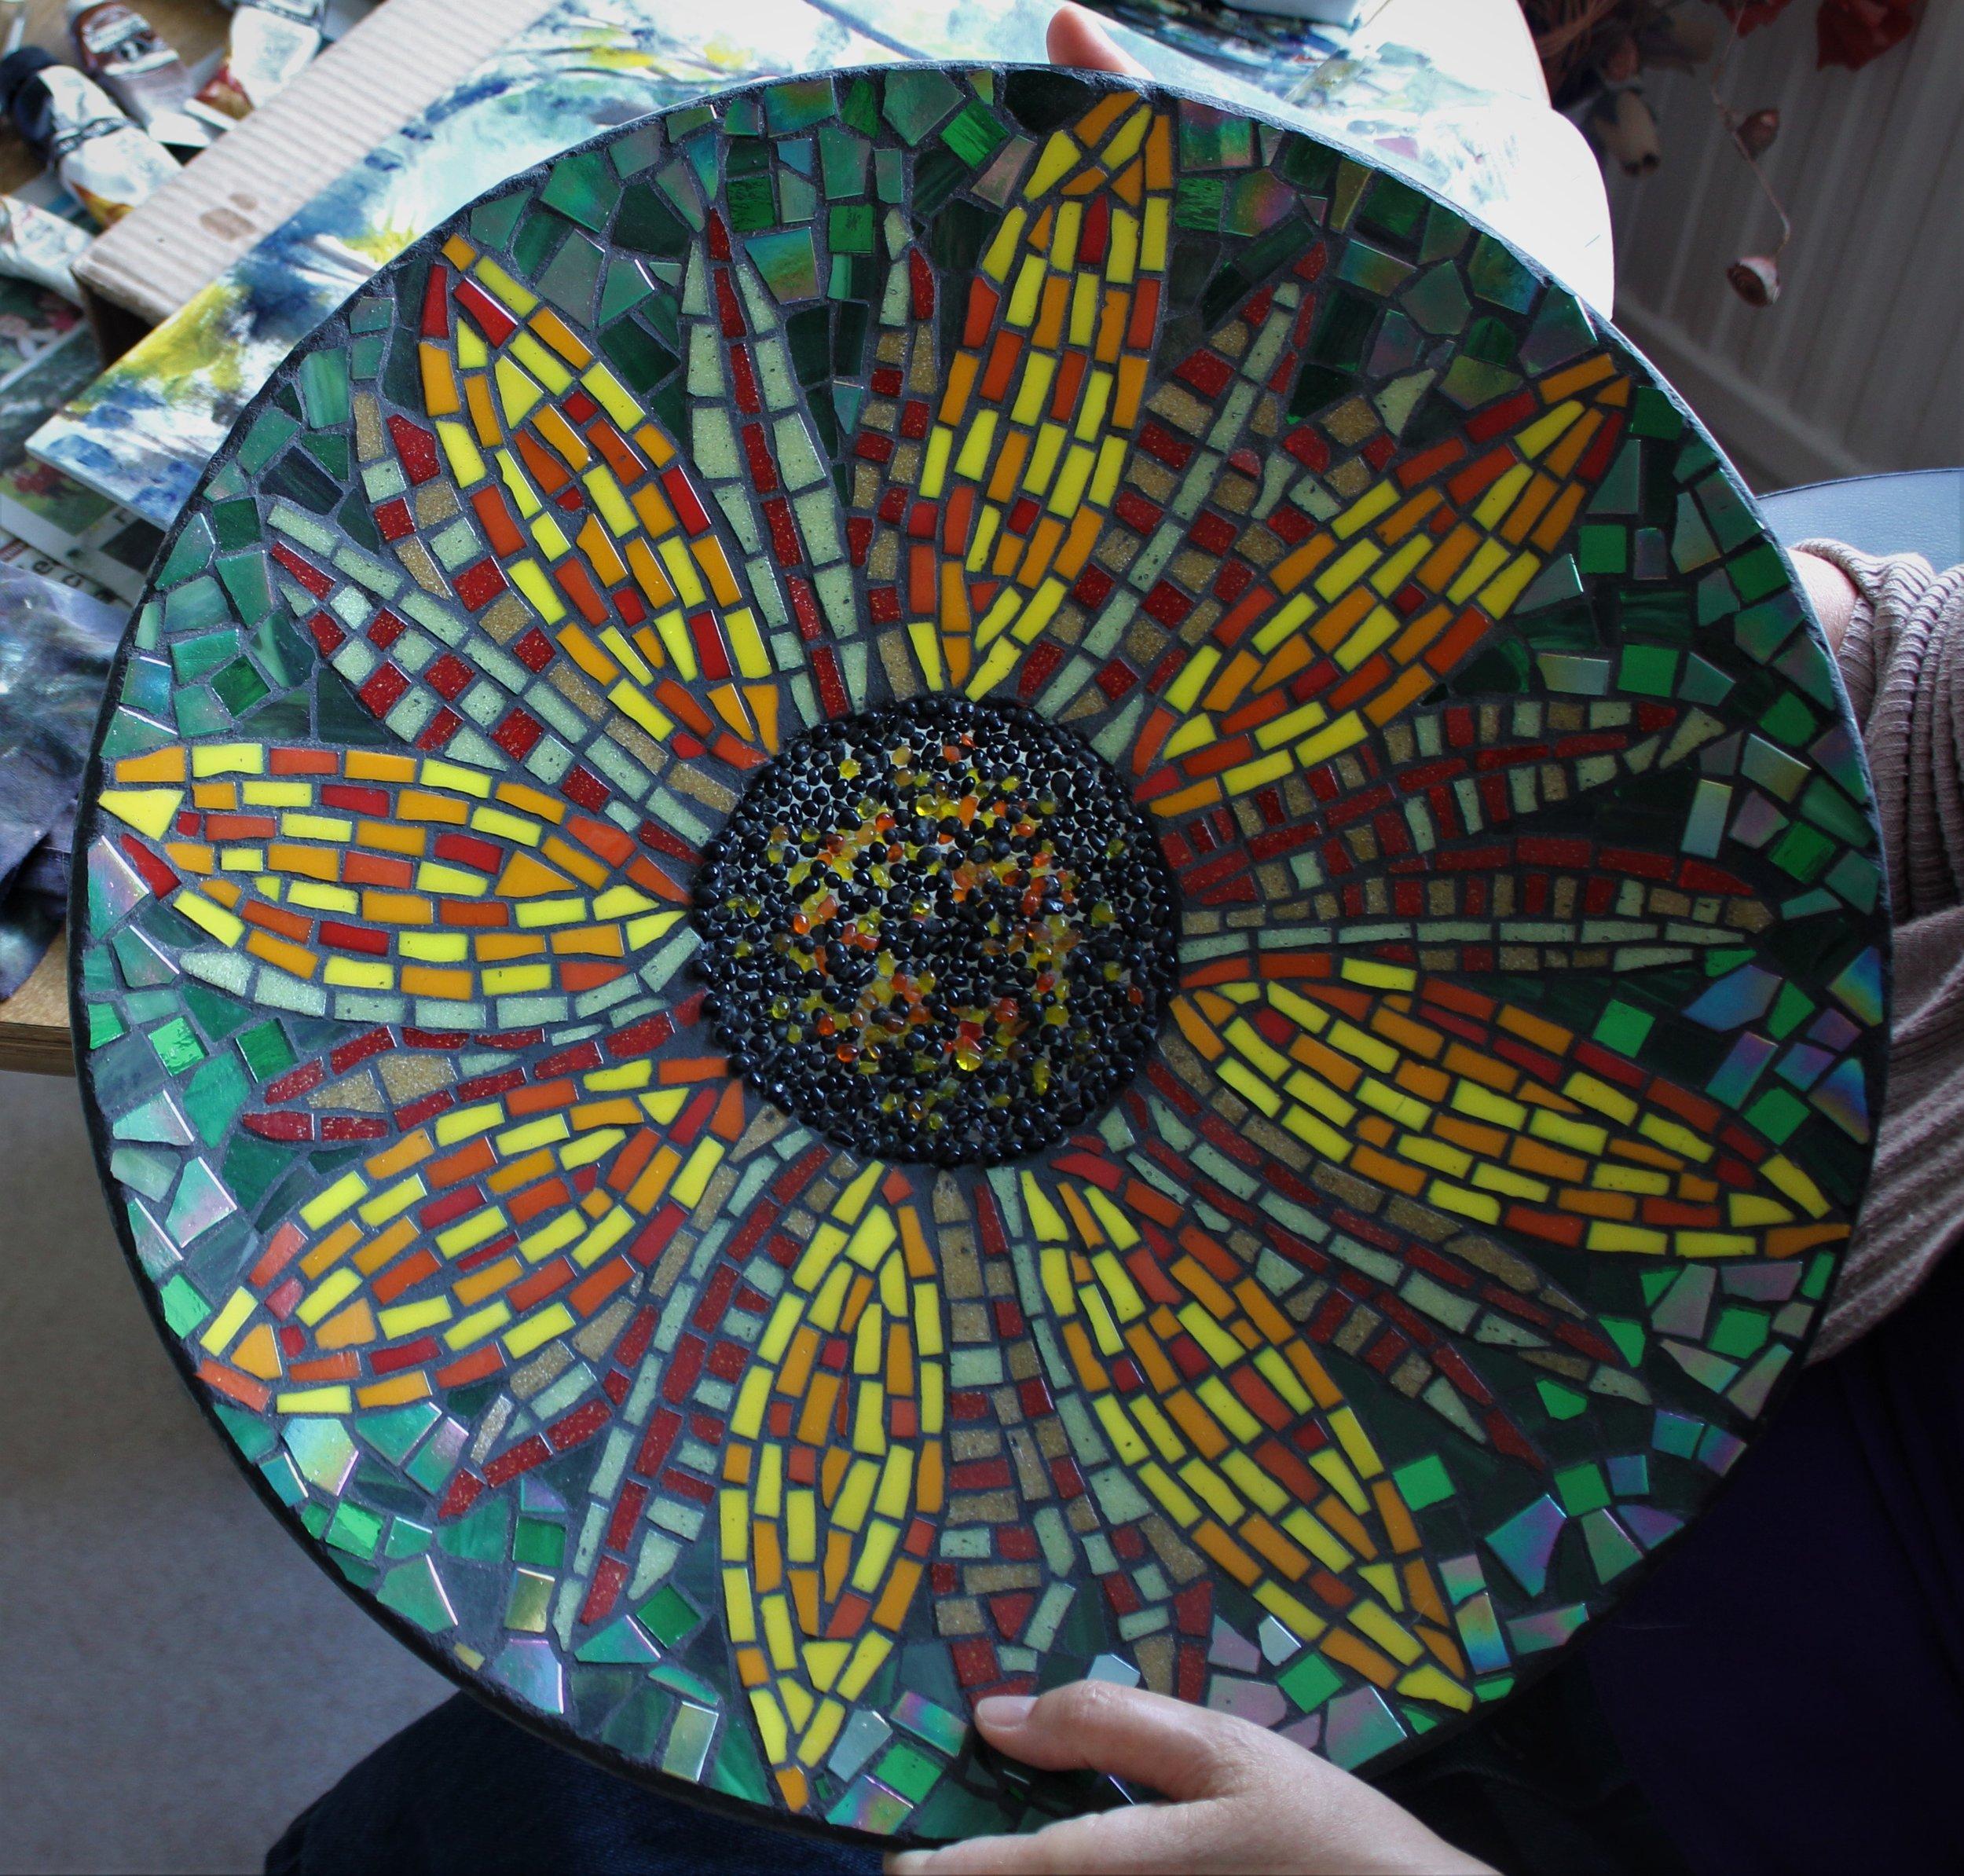 The Sunflower Bowl